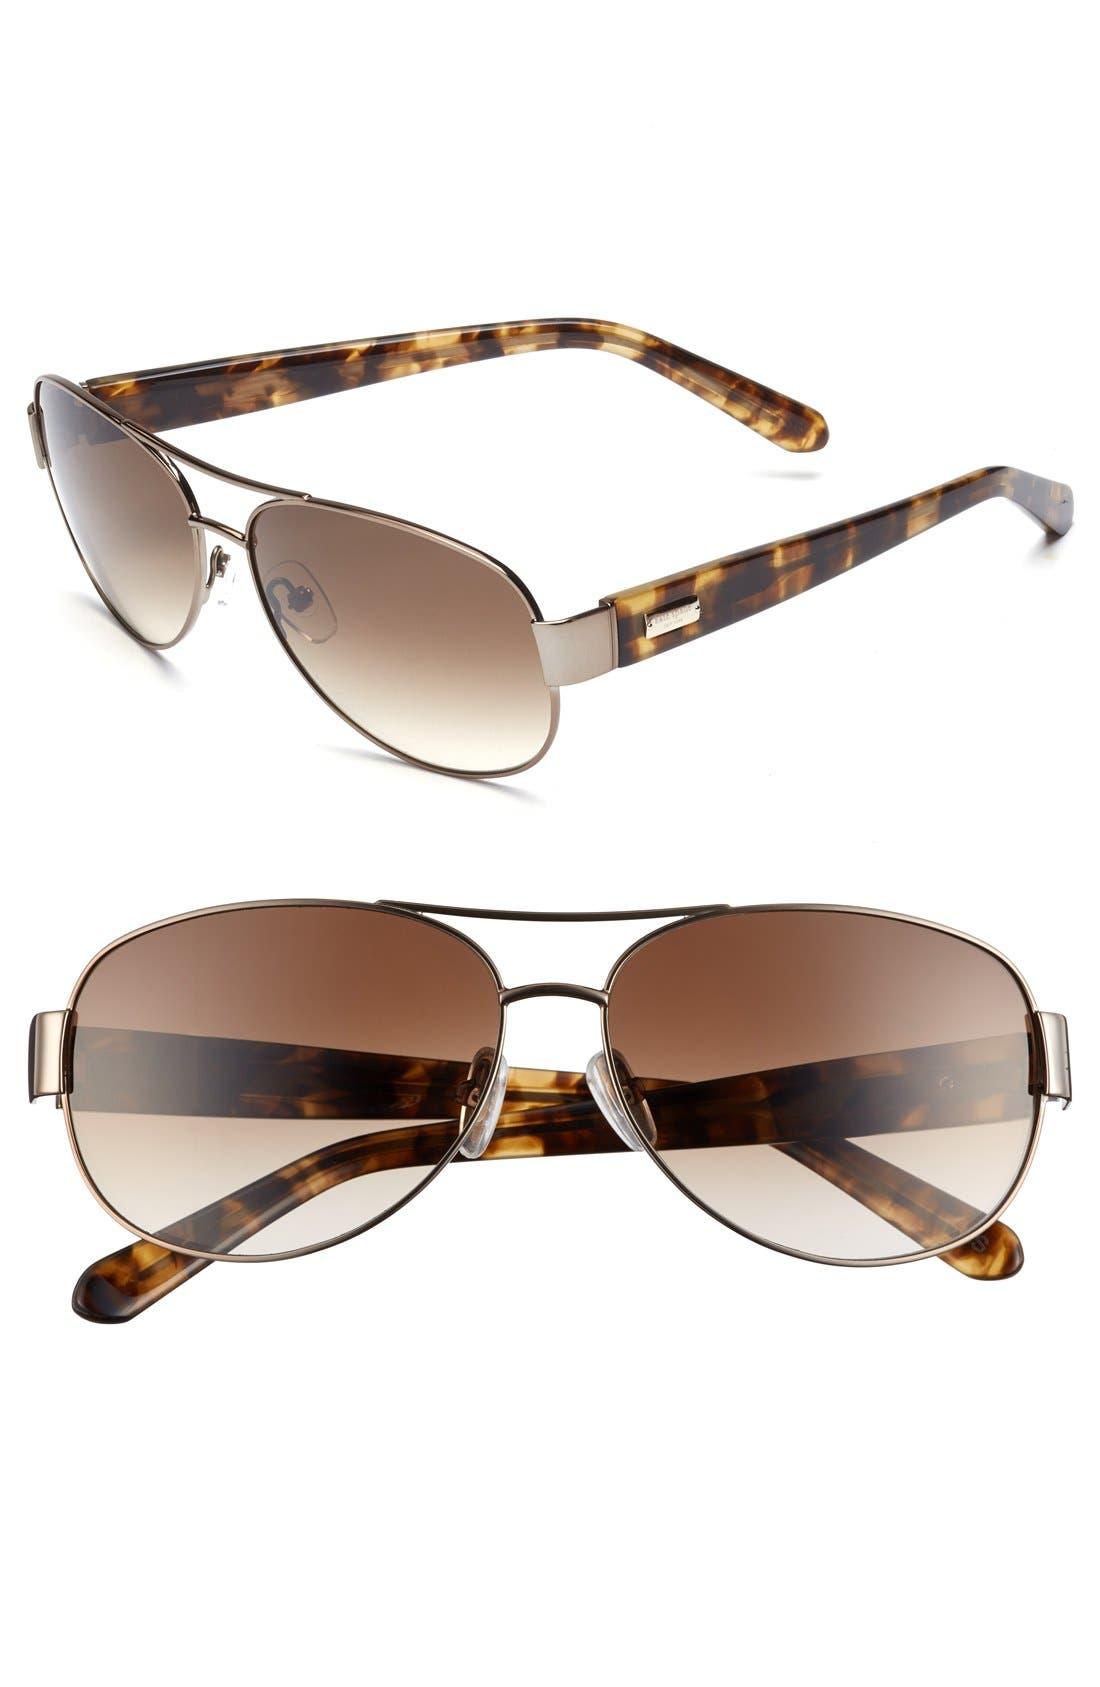 Main Image - RAEN 'Maude' 53mm Sunglasses